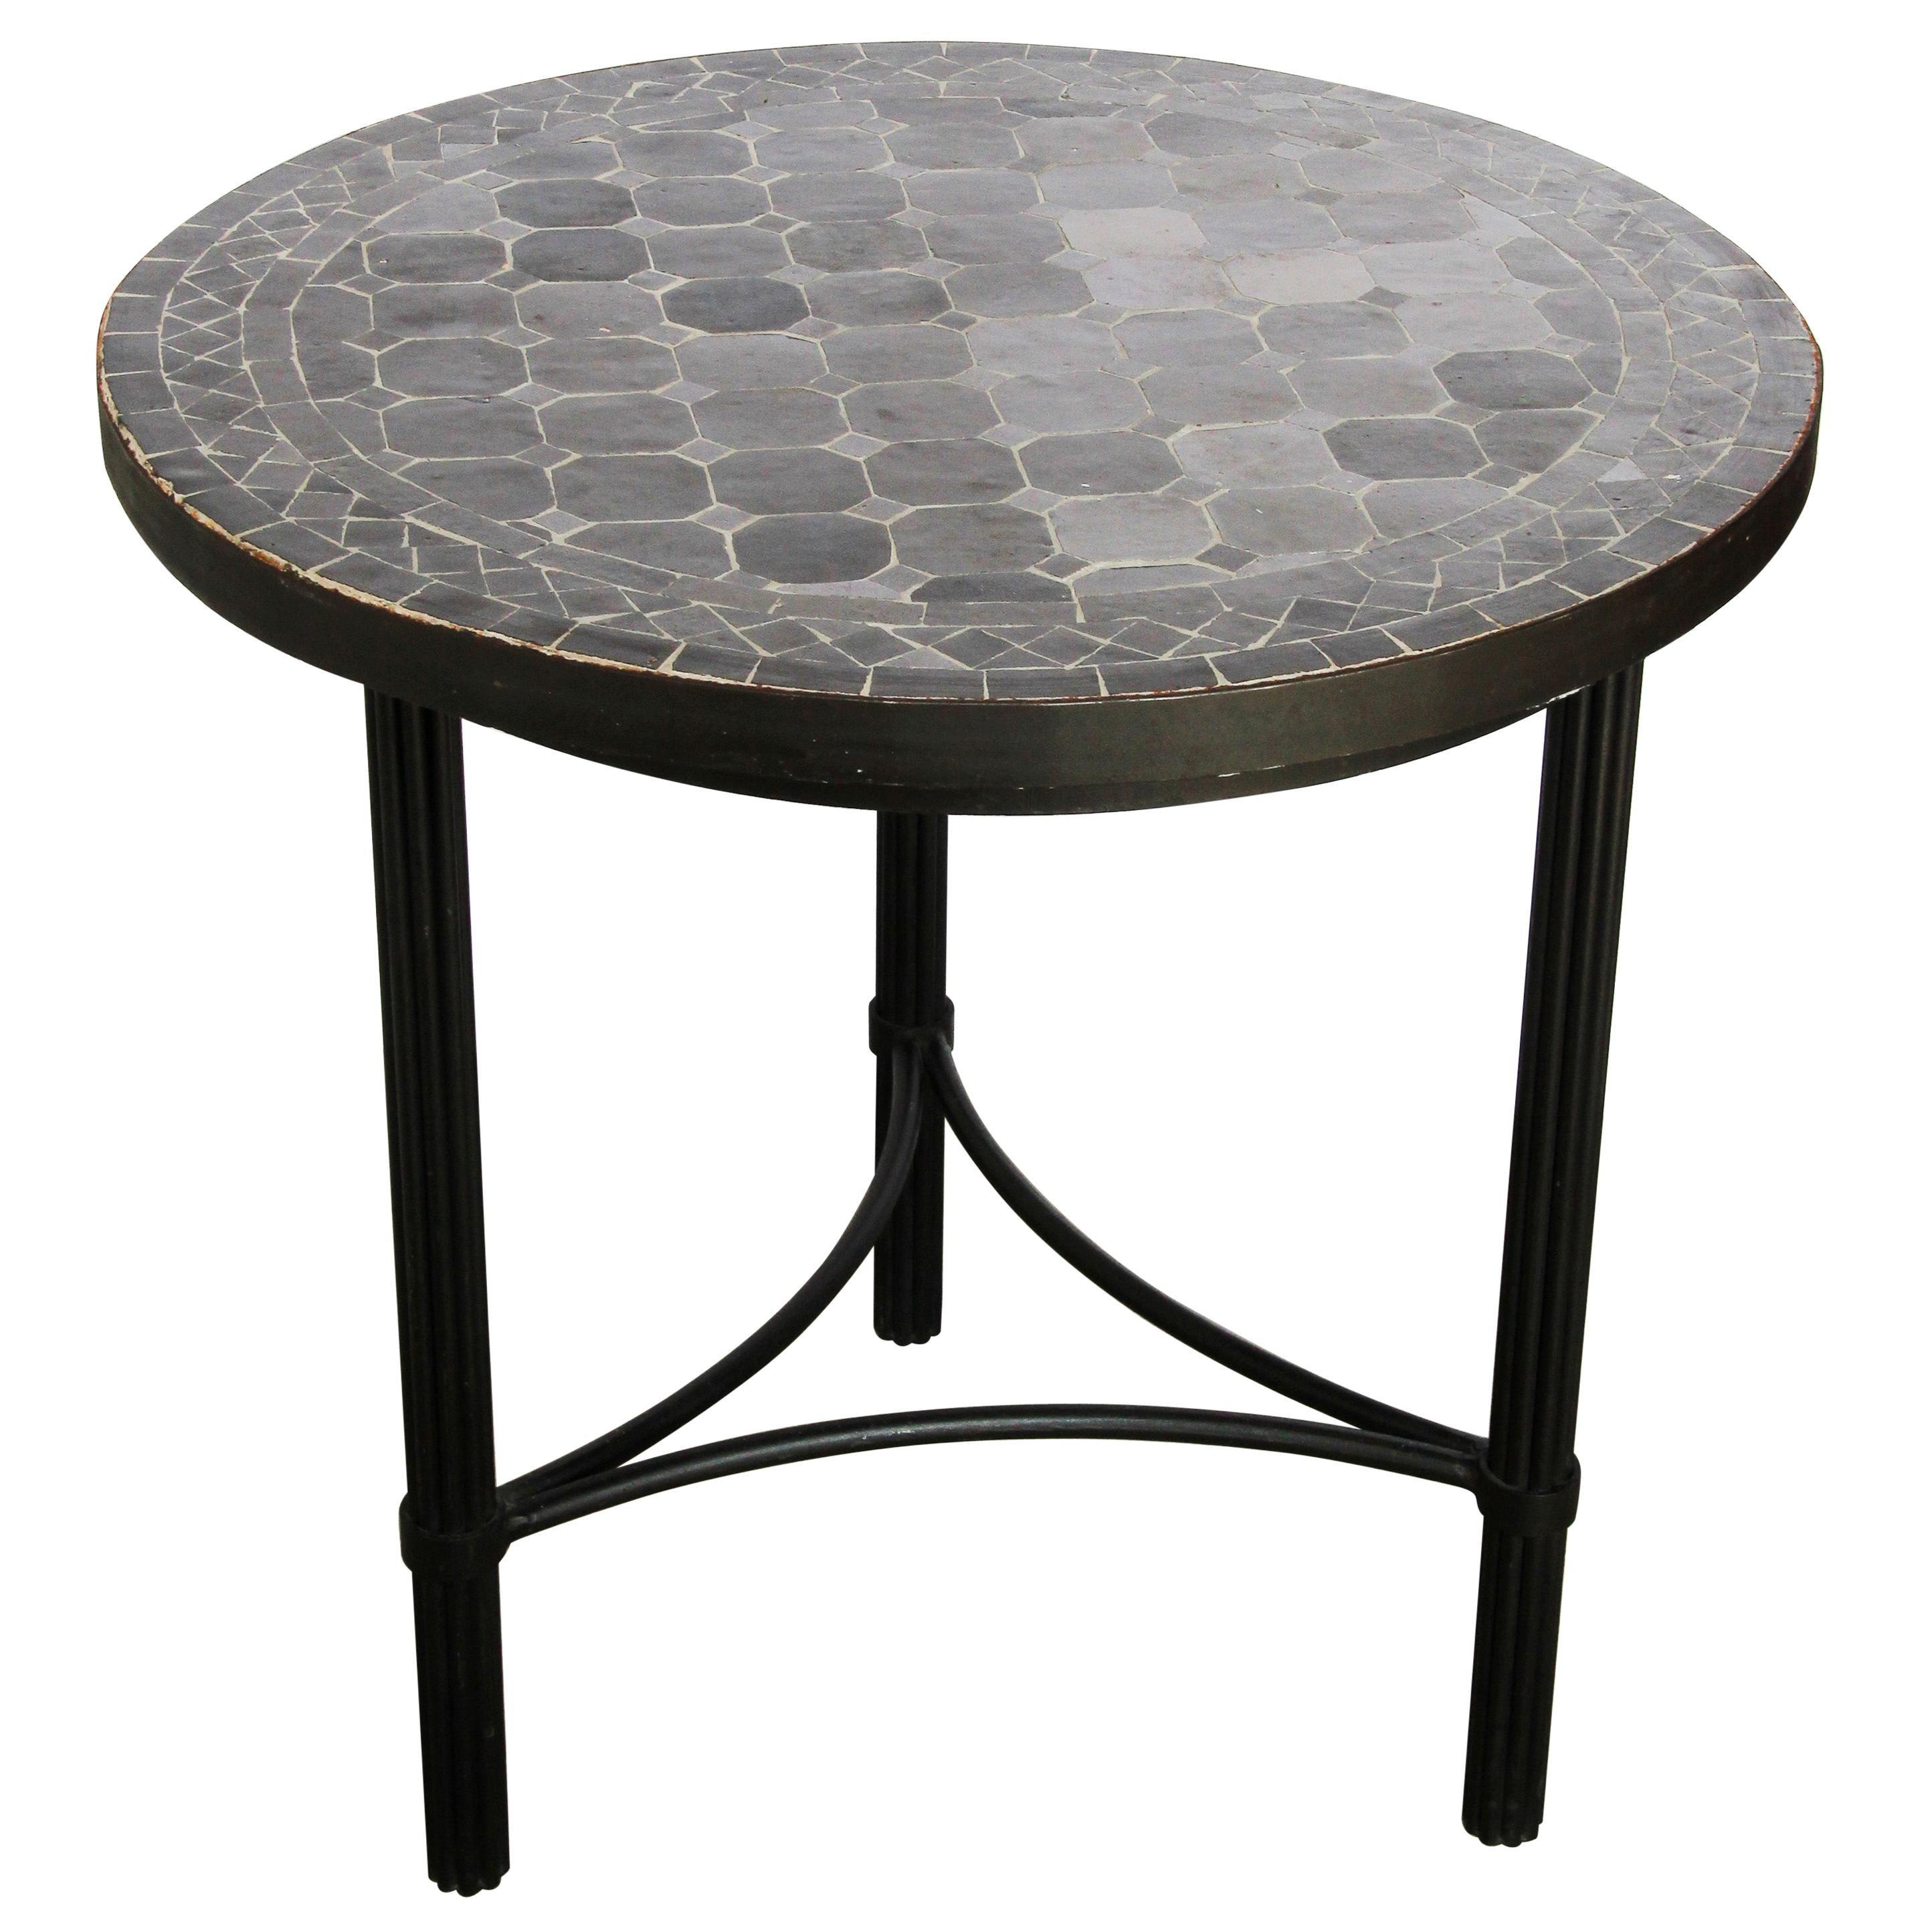 moroccan mosaic black color bistro tile table